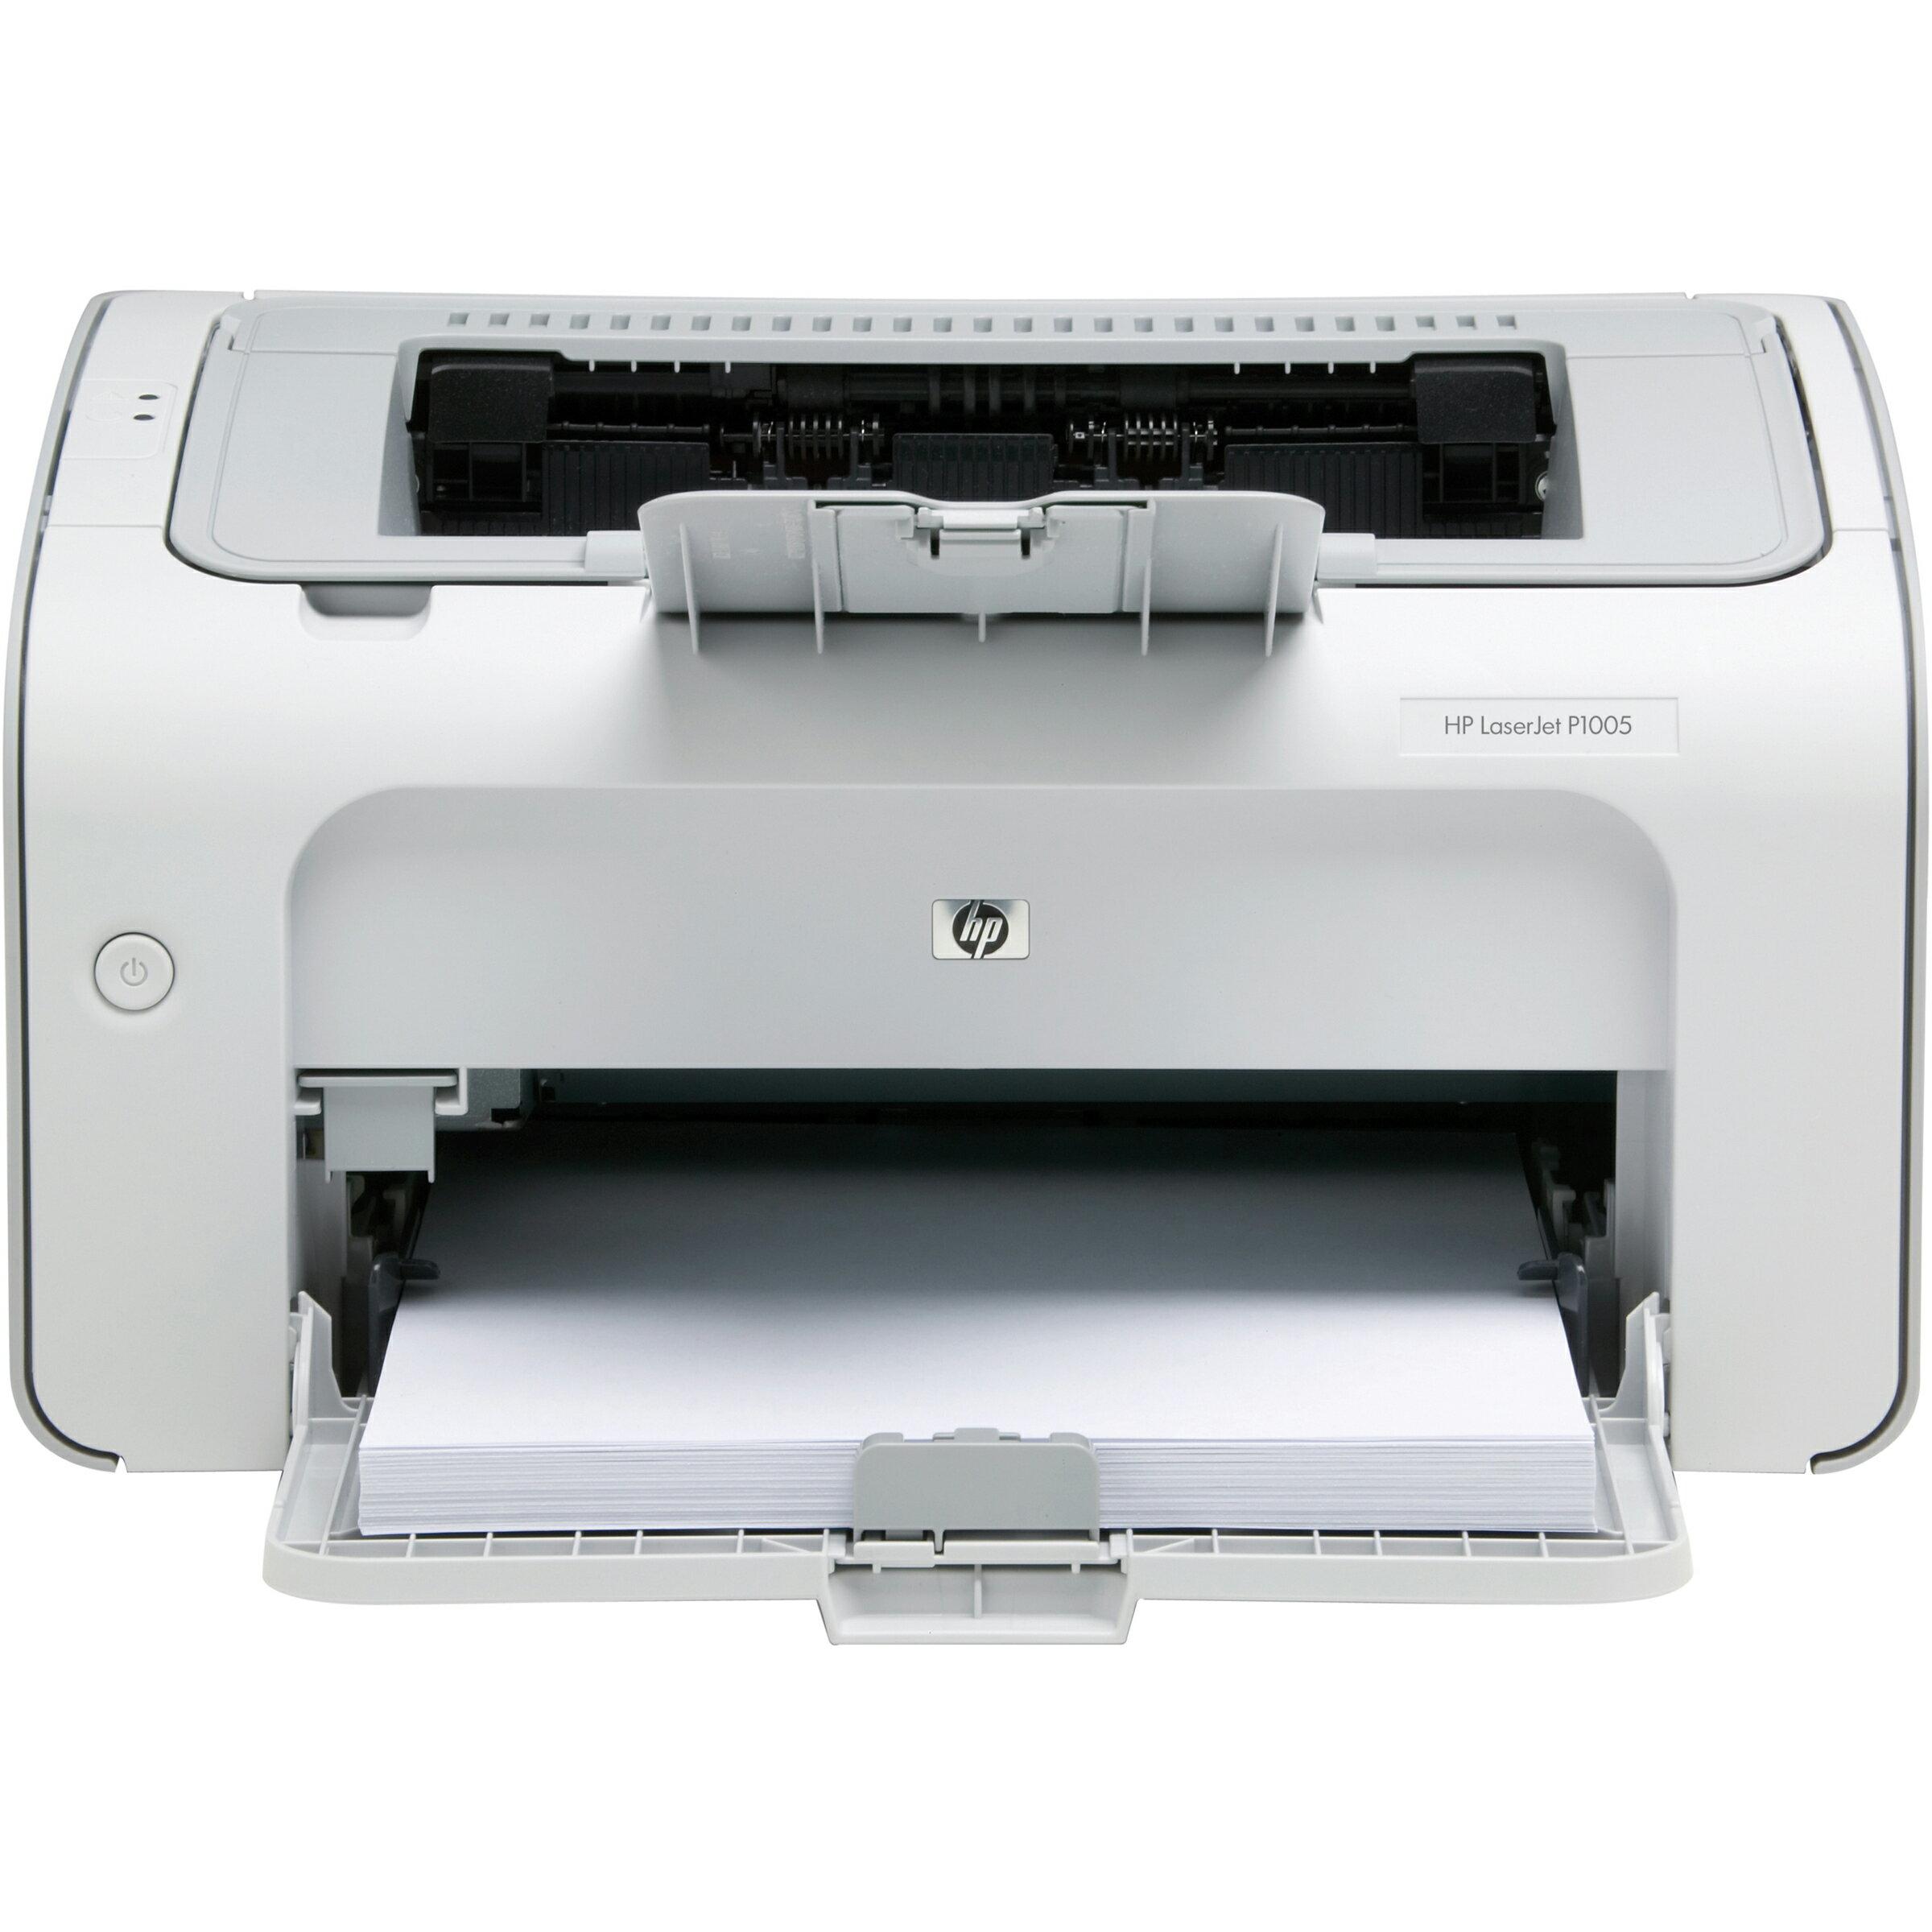 HP LaserJet P1005 Printer 0